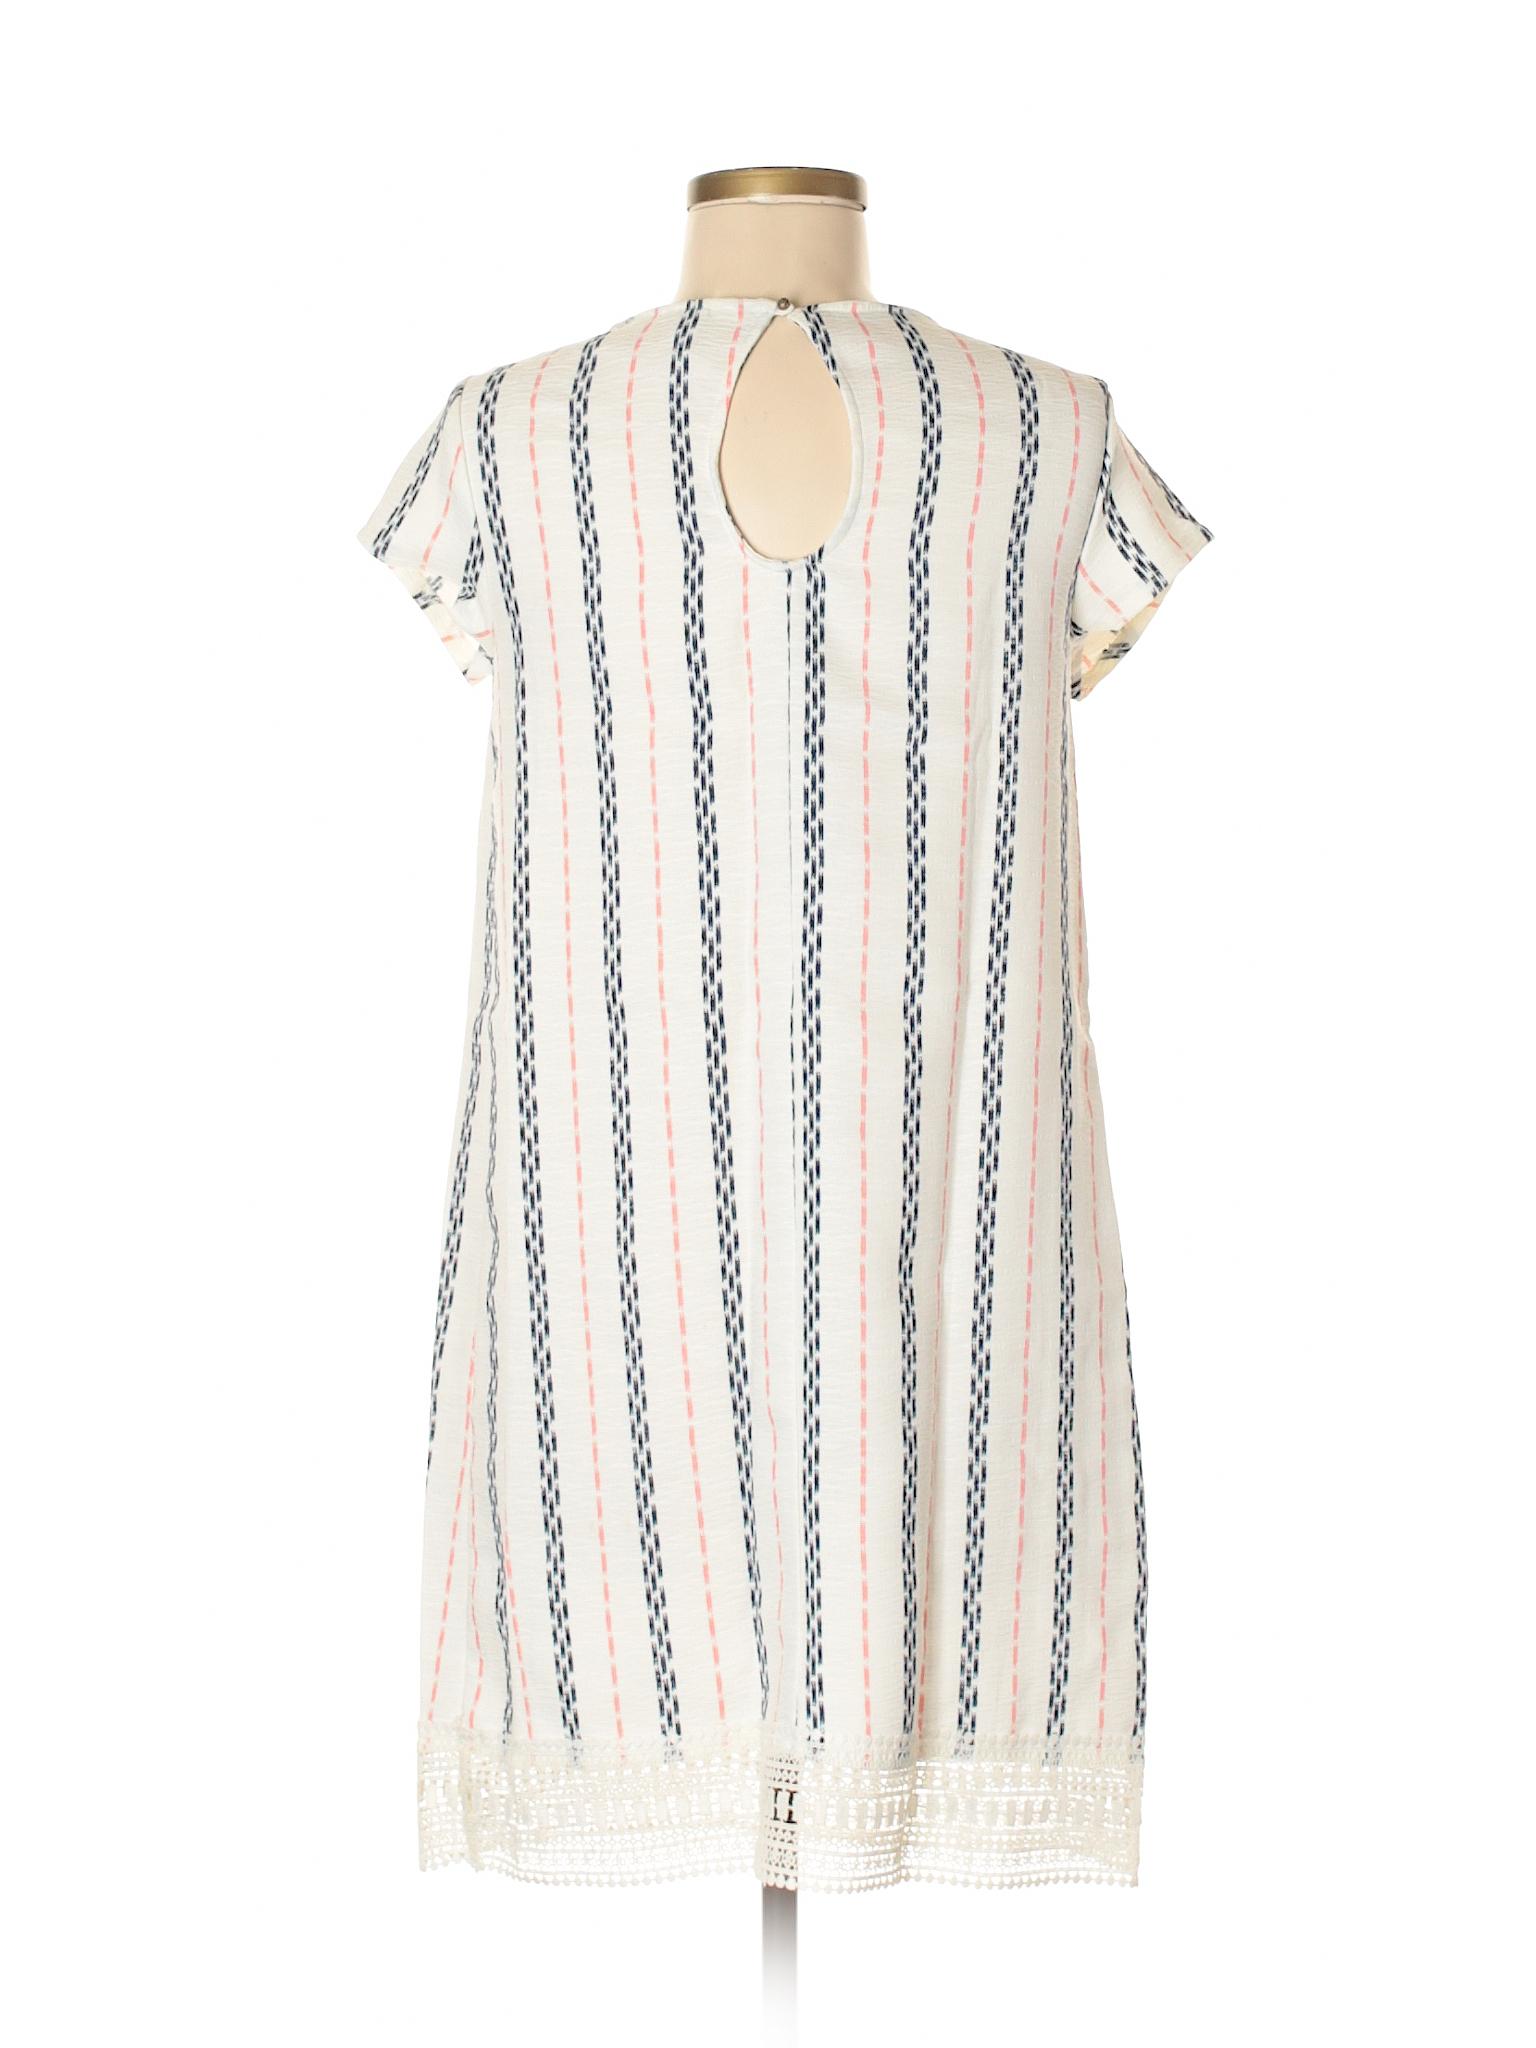 Casual Xhilaration Boutique Boutique winter Xhilaration Boutique winter Dress Casual Dress winter gzfawxZg